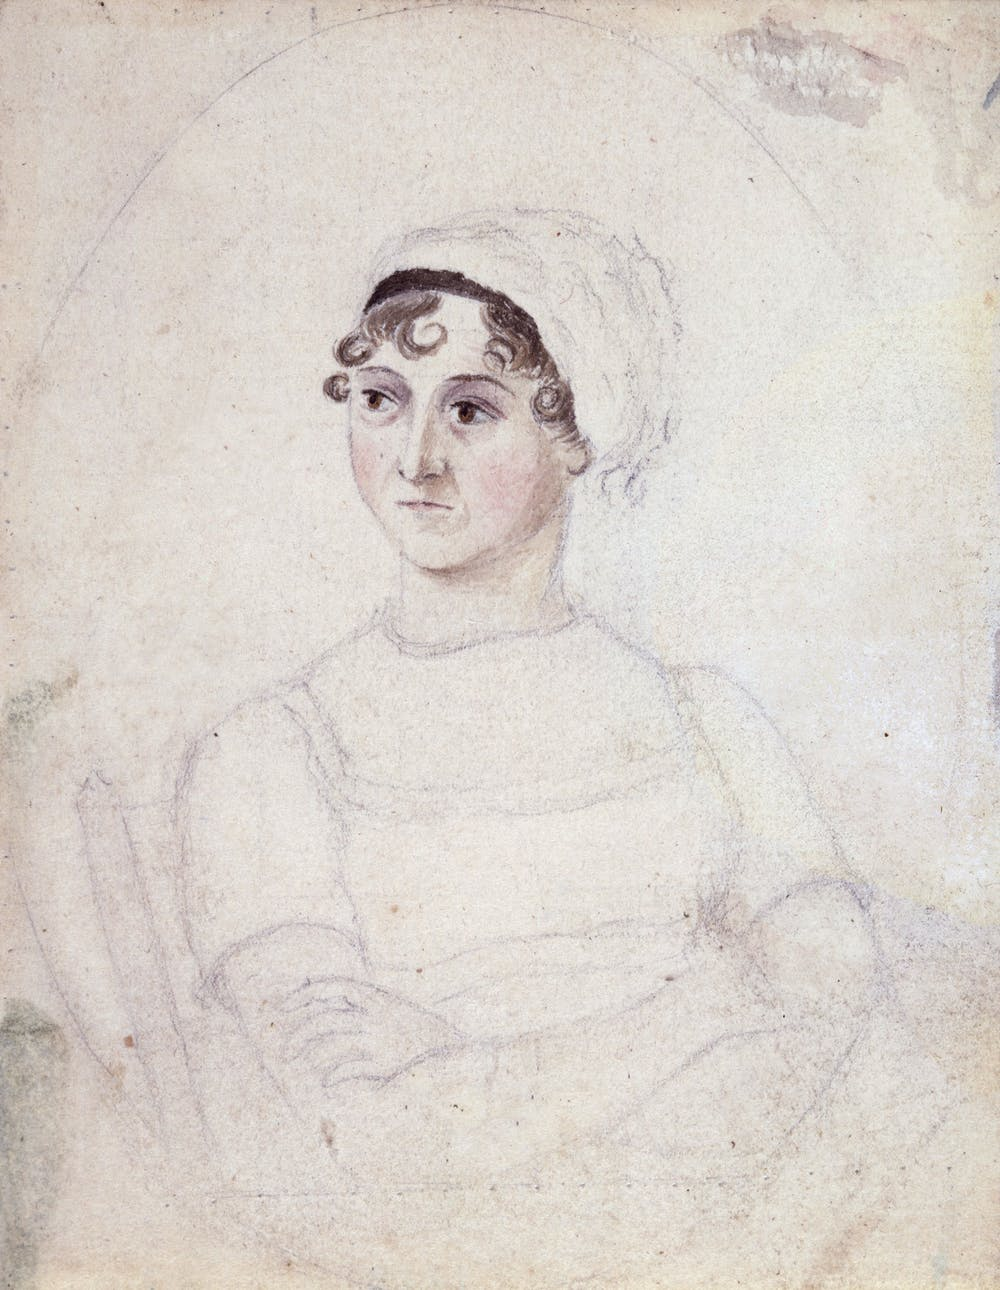 friday essay the revolutionary vision of jane austen cassandra austen s portrait of her sister jane circa 1810 commons